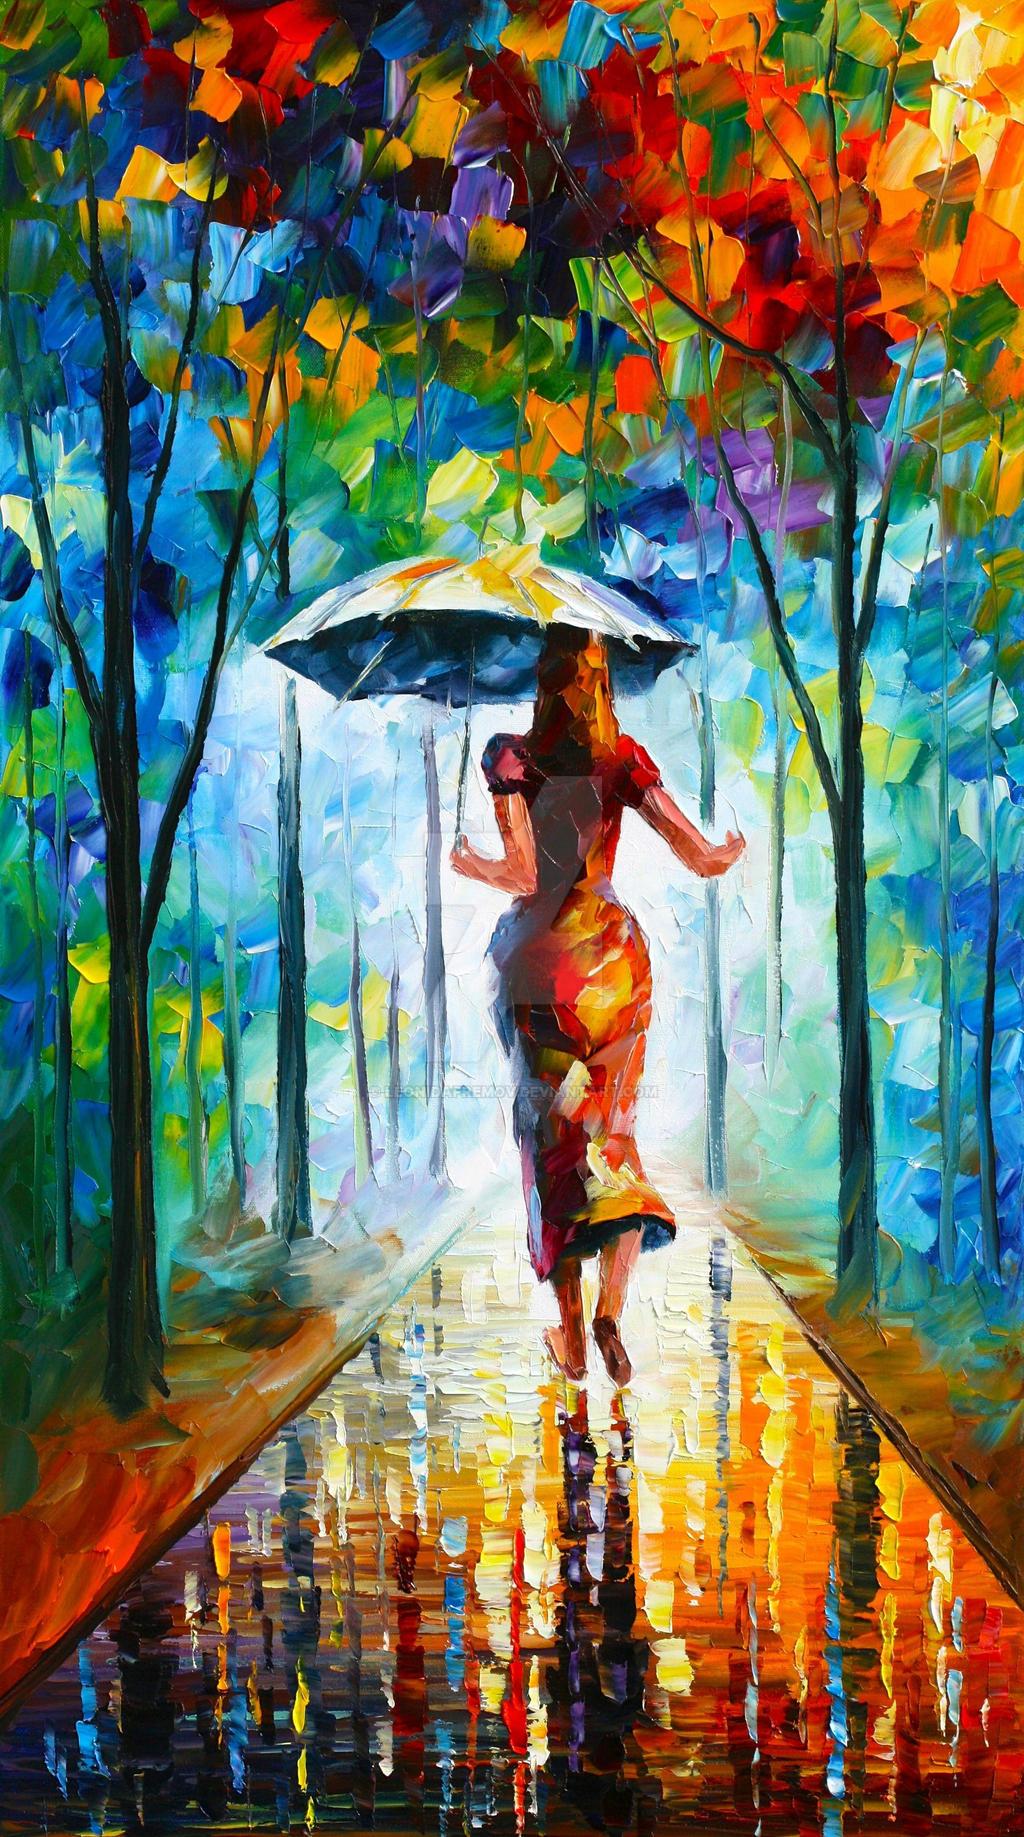 Running Towards Love by Leonid Afremov by Leonidafremov